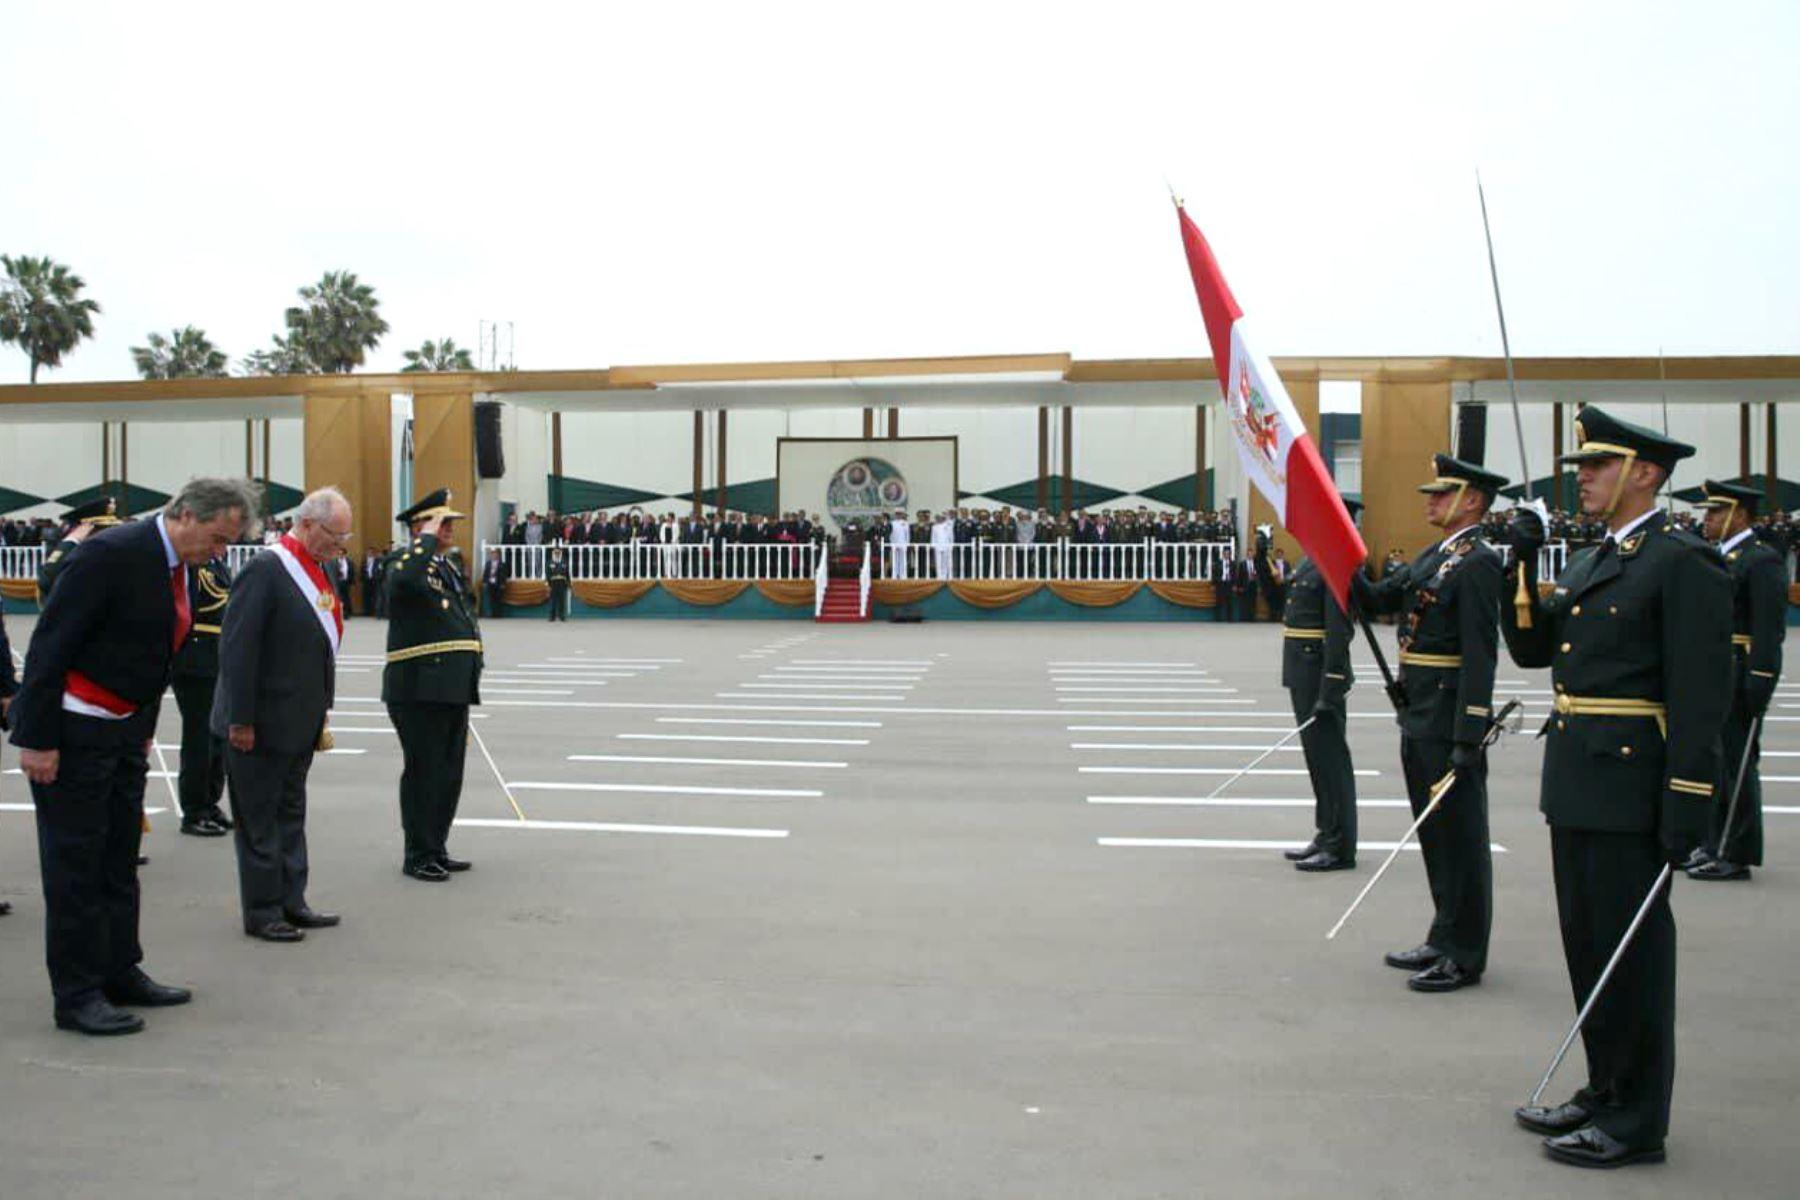 Presidente Kuczynski  preside ceremonia por el XXIX aniversario de la Policía Nacional. Foto: ANDINA/Prensa Presidencia